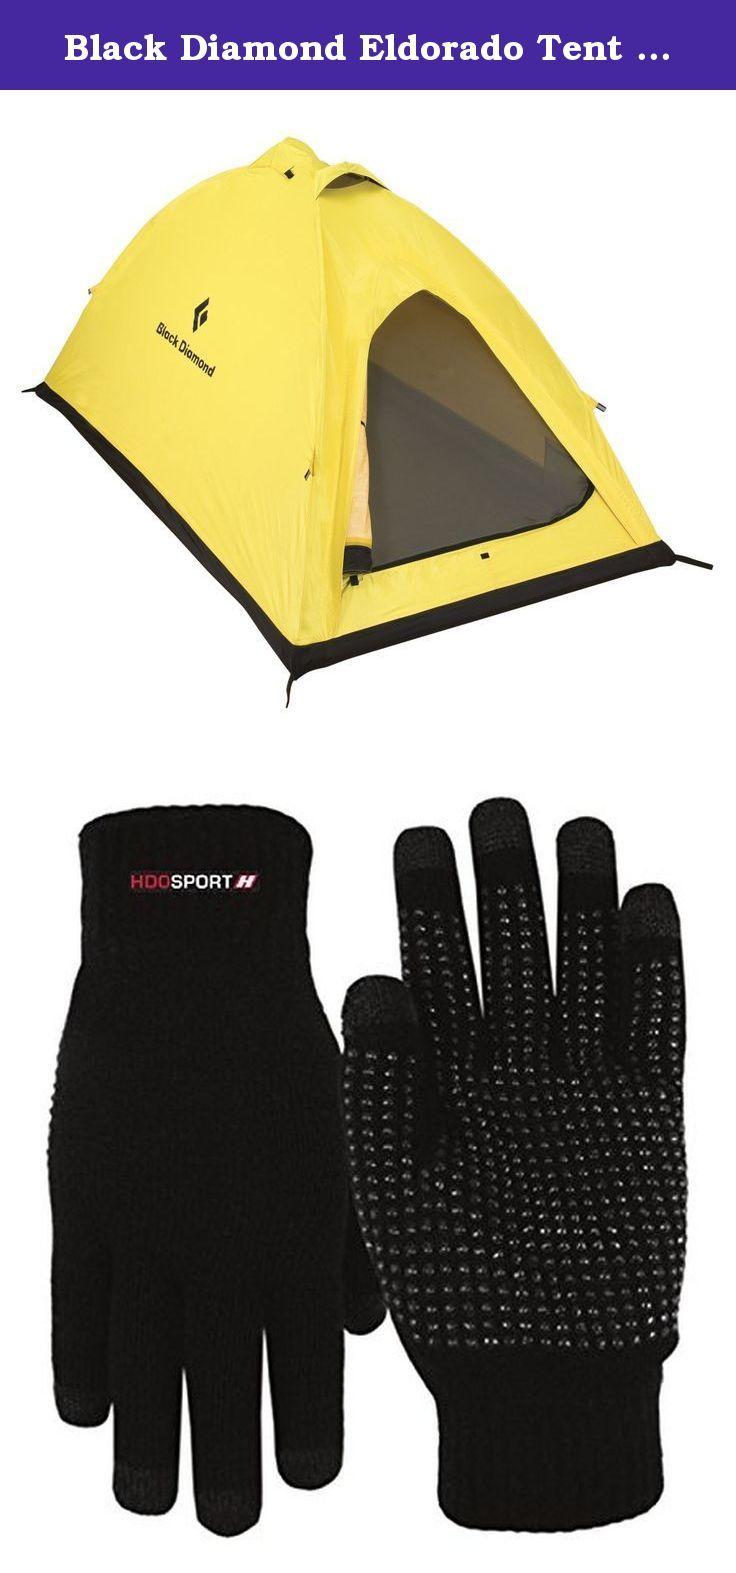 Black Diamond Eldorado Tent and HDO Lite E-tip Gloves with Grippers. Black Diamond  sc 1 st  Pinterest & Black Diamond Eldorado Tent and HDO Lite E-tip Gloves with ...